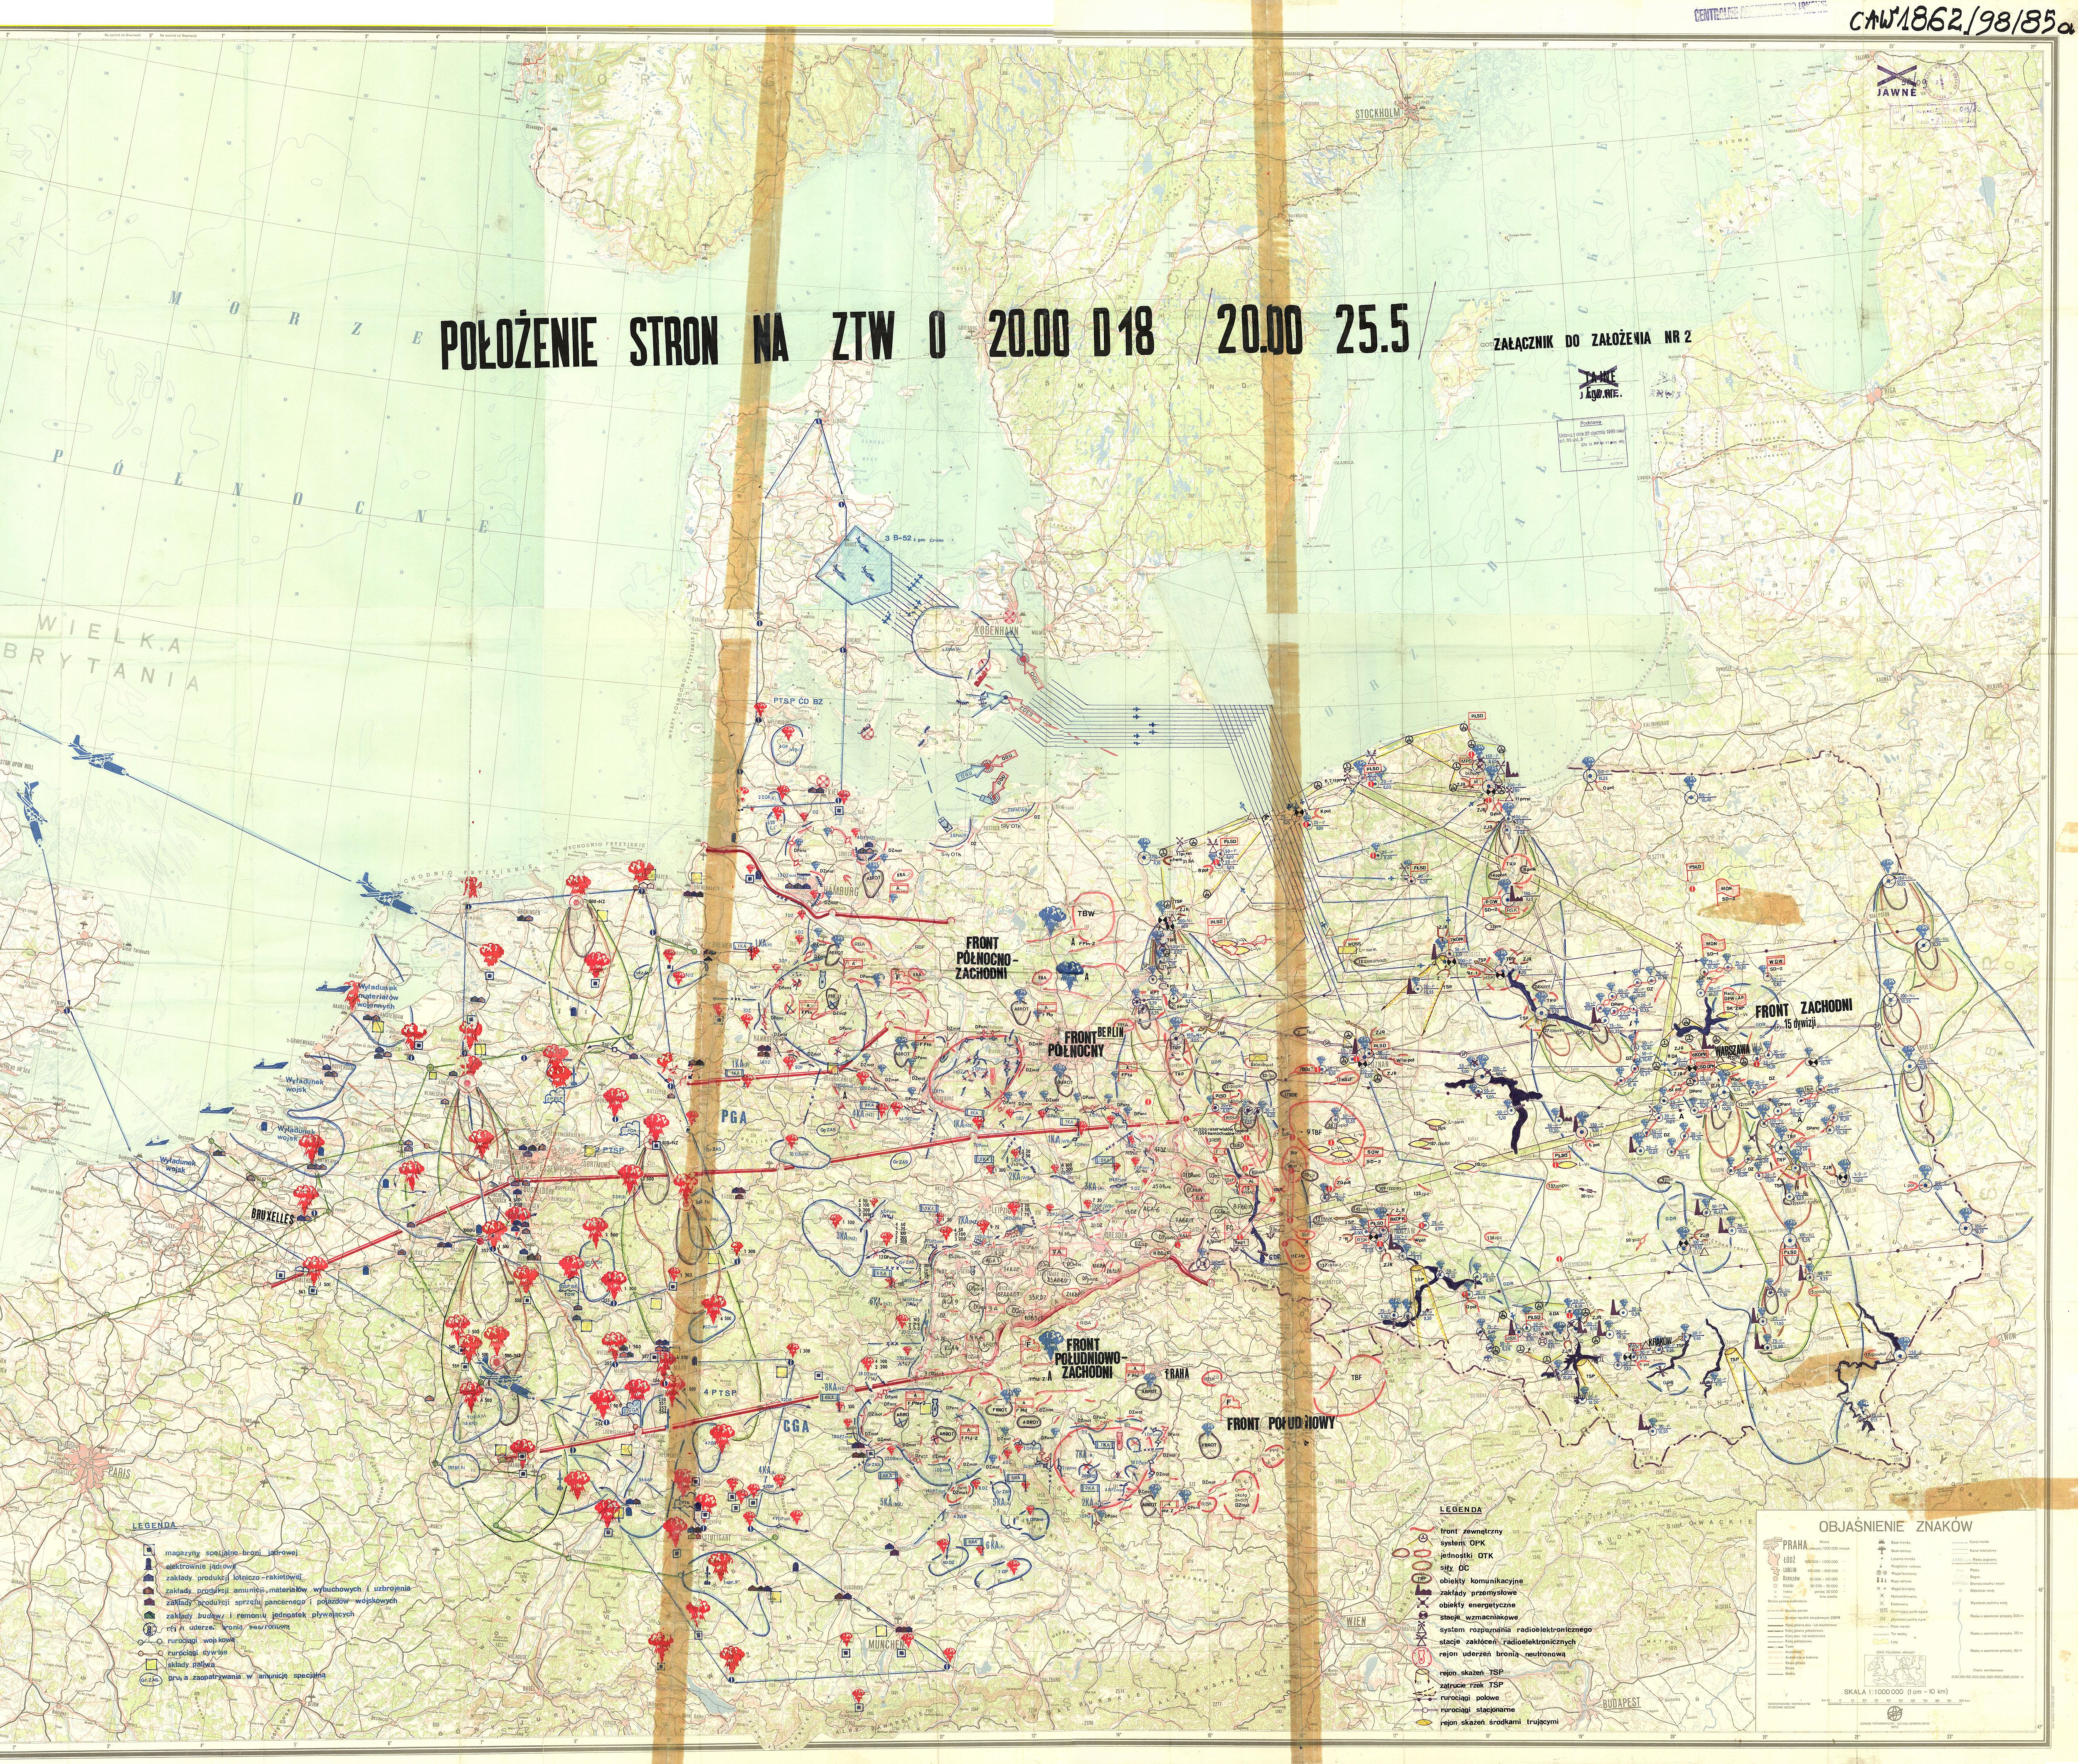 https://eloblog.pl/wp-content/uploads/2017/10/mapa-celow-ataku-nuklearnego.jpg